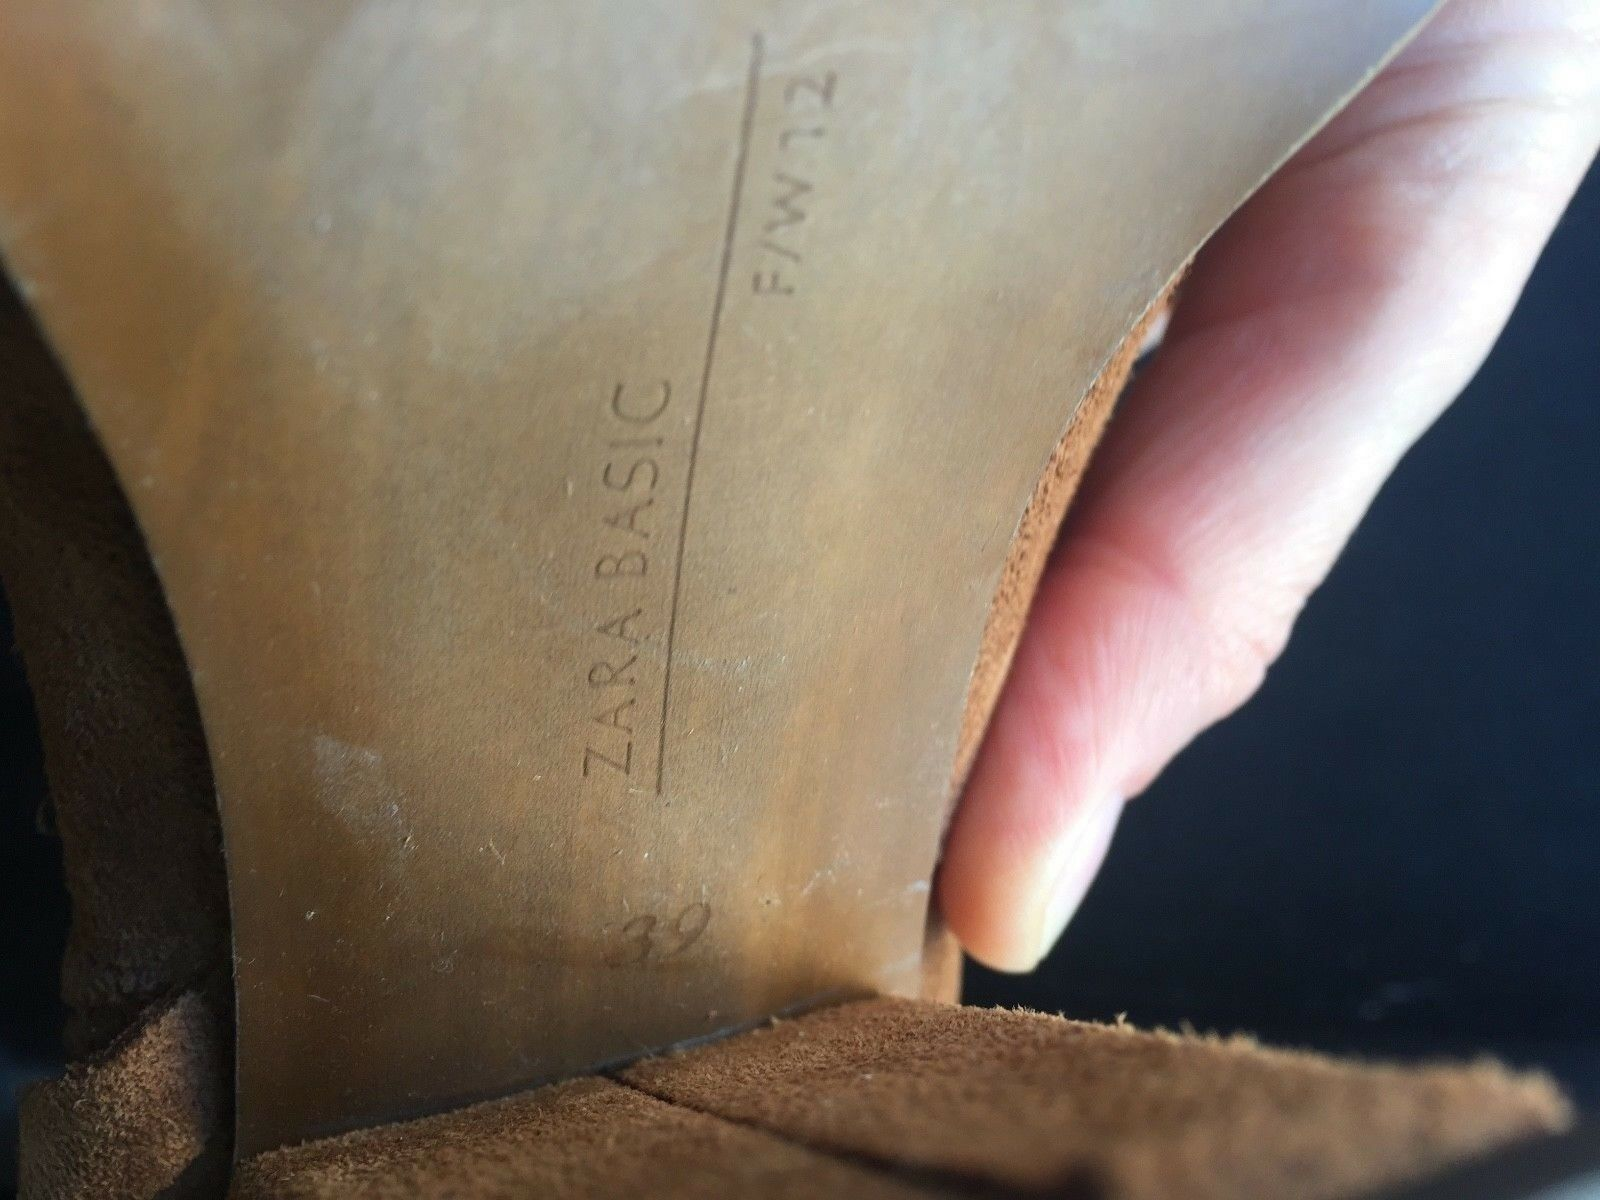 ZARA Stiefeletten Halbstiefel mit Heel Gr. Farbe: 39 Wildleder Farbe: Gr. Cognac, NEU de9aa4